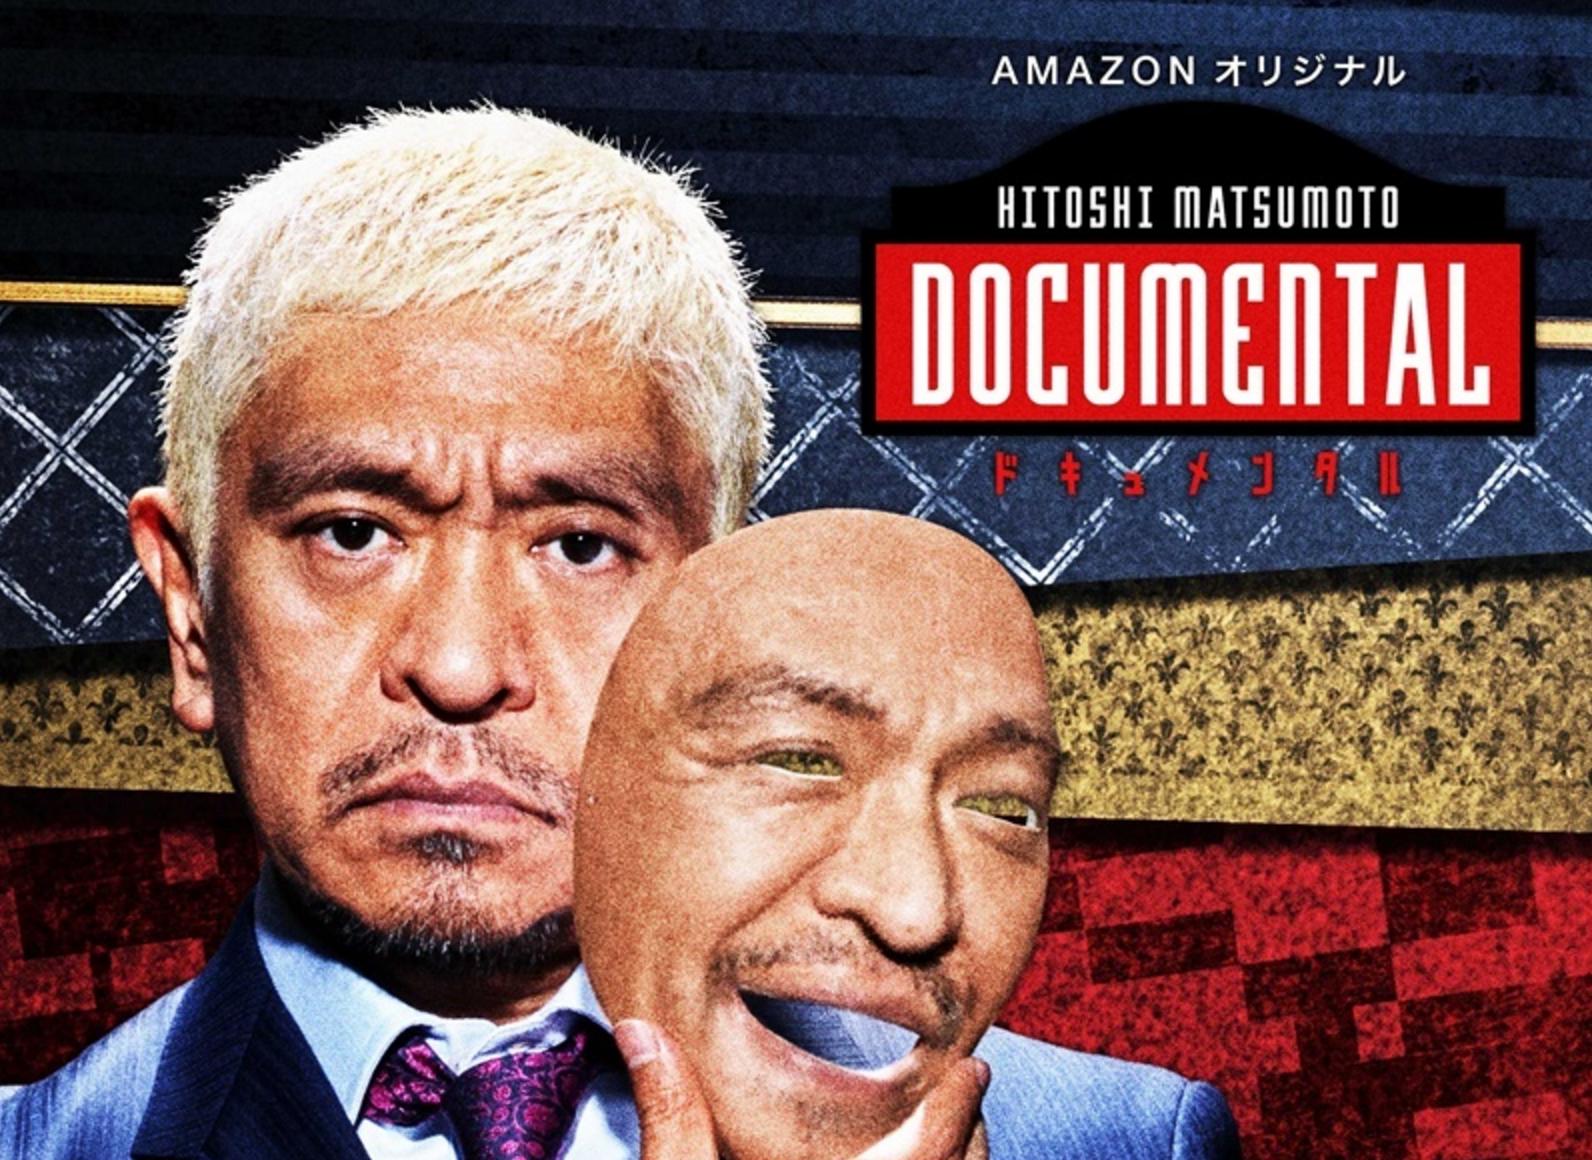 Amazonプライムビデオで松本人志のドキュメンタルが独占放送!参加費100万円、笑ったら即退場?